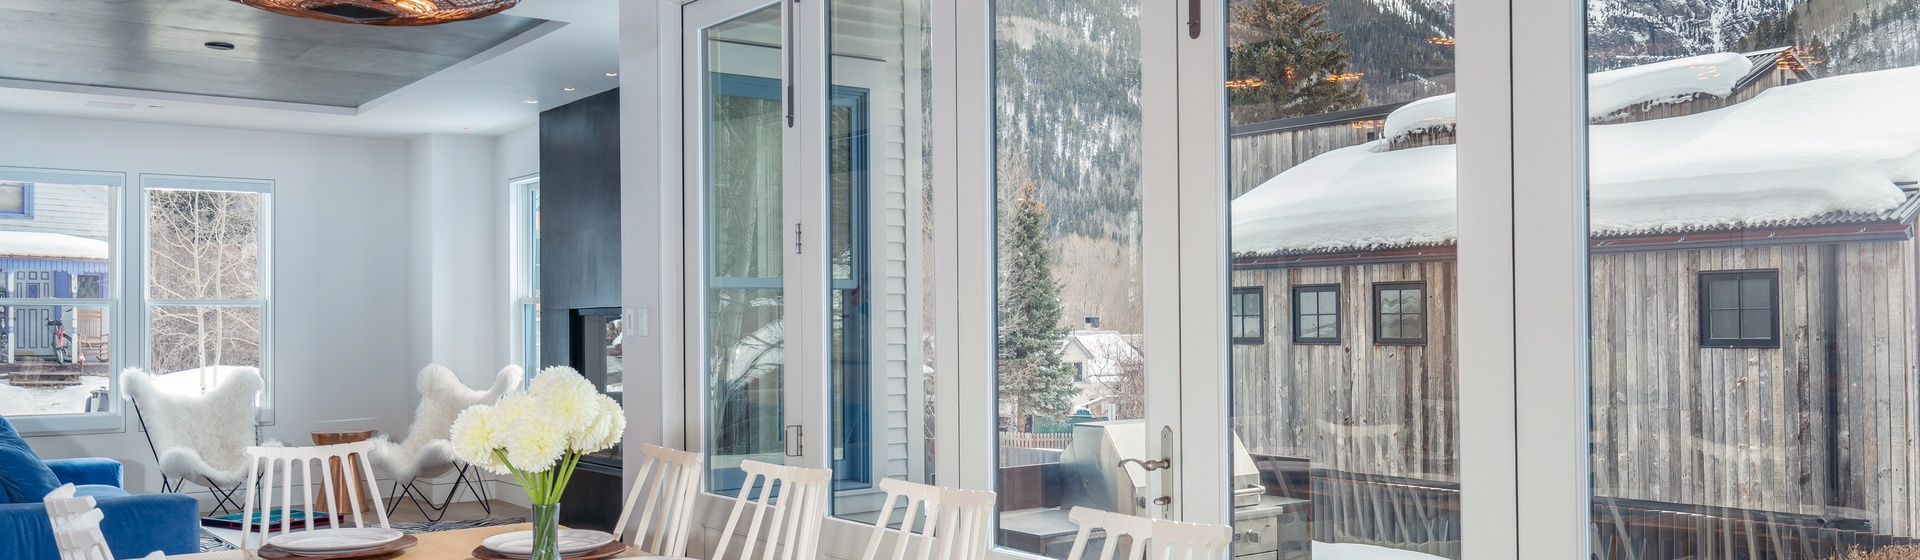 2-Telluride-The-Sunnyside-Dining-View-Web.jpg